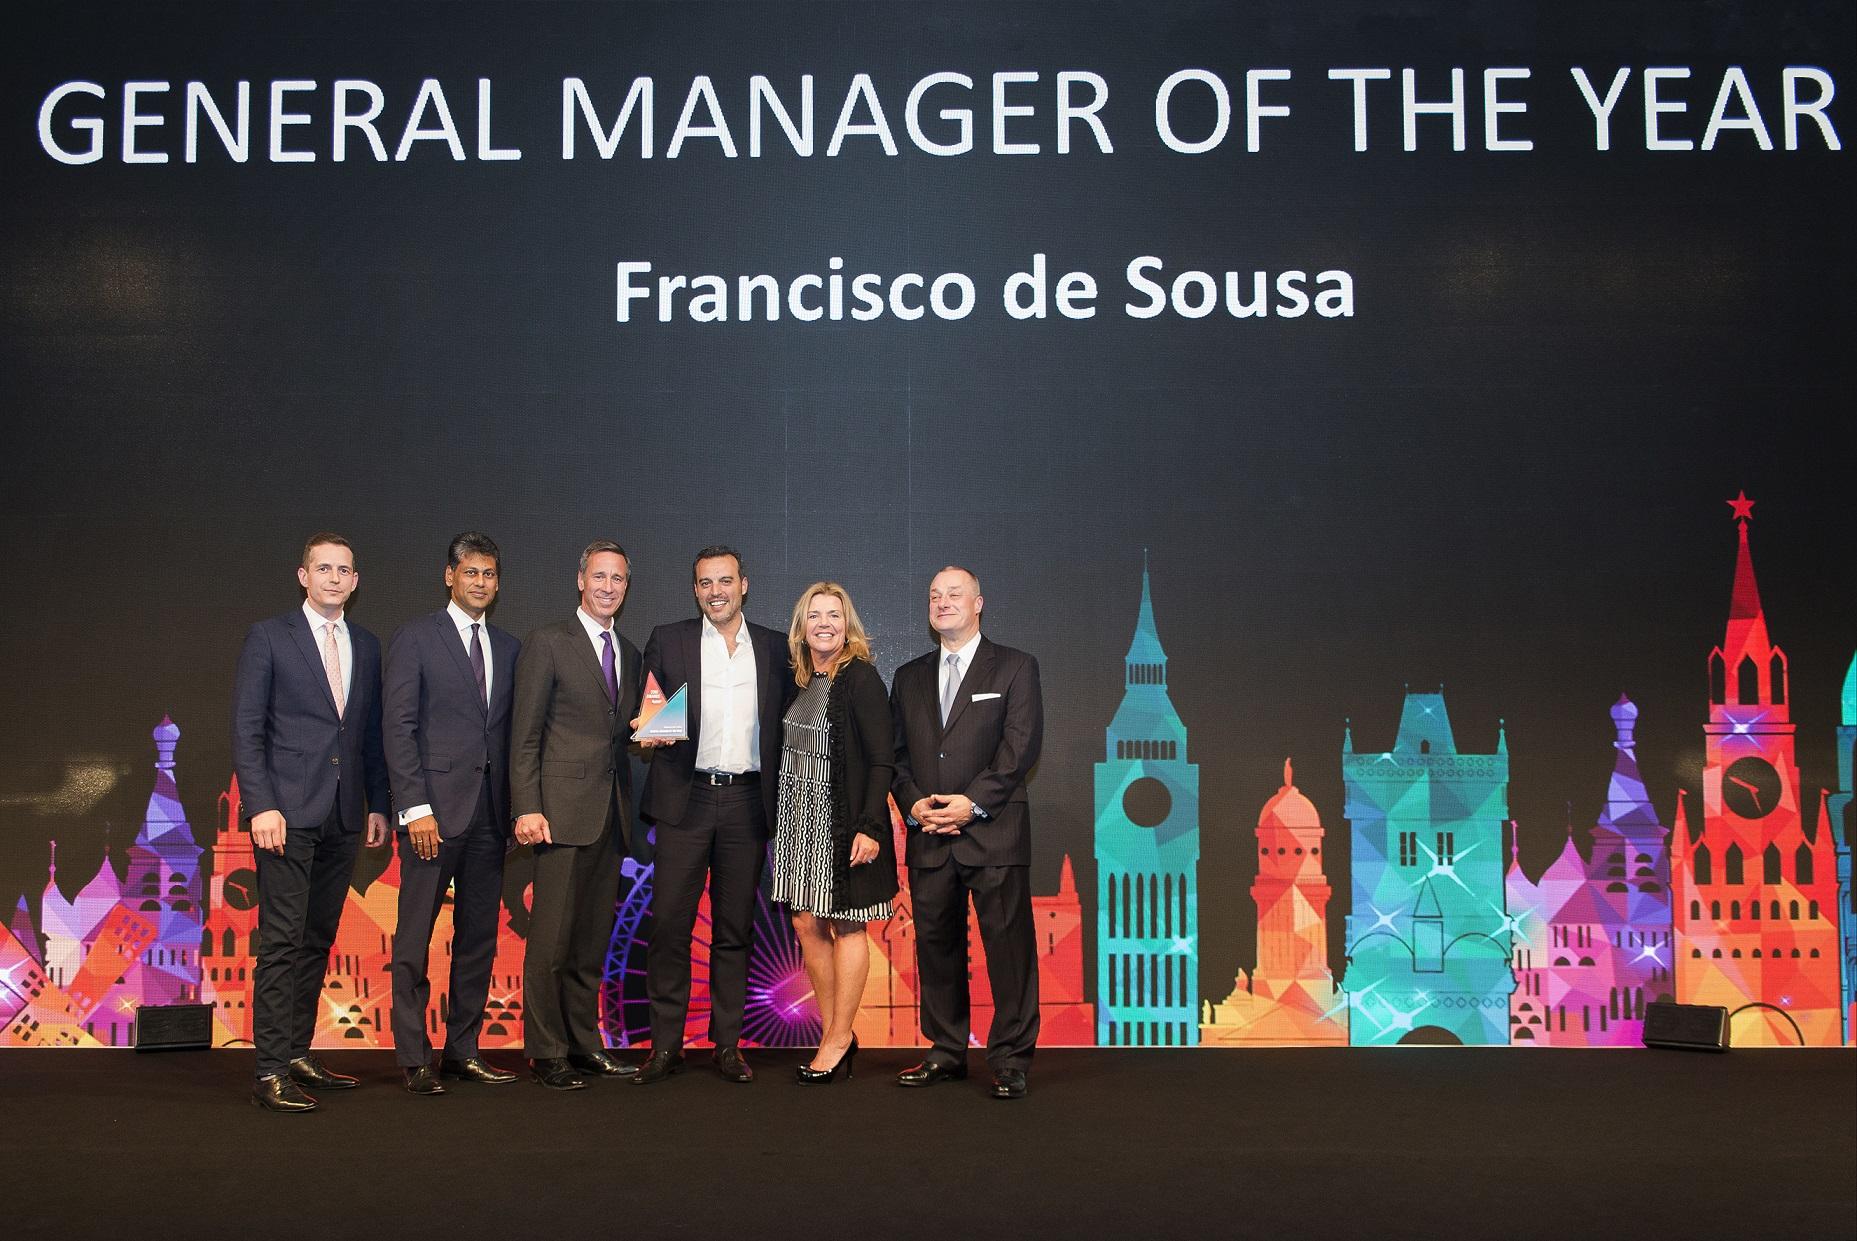 francisco_nogueira_sousa_general_manager_print